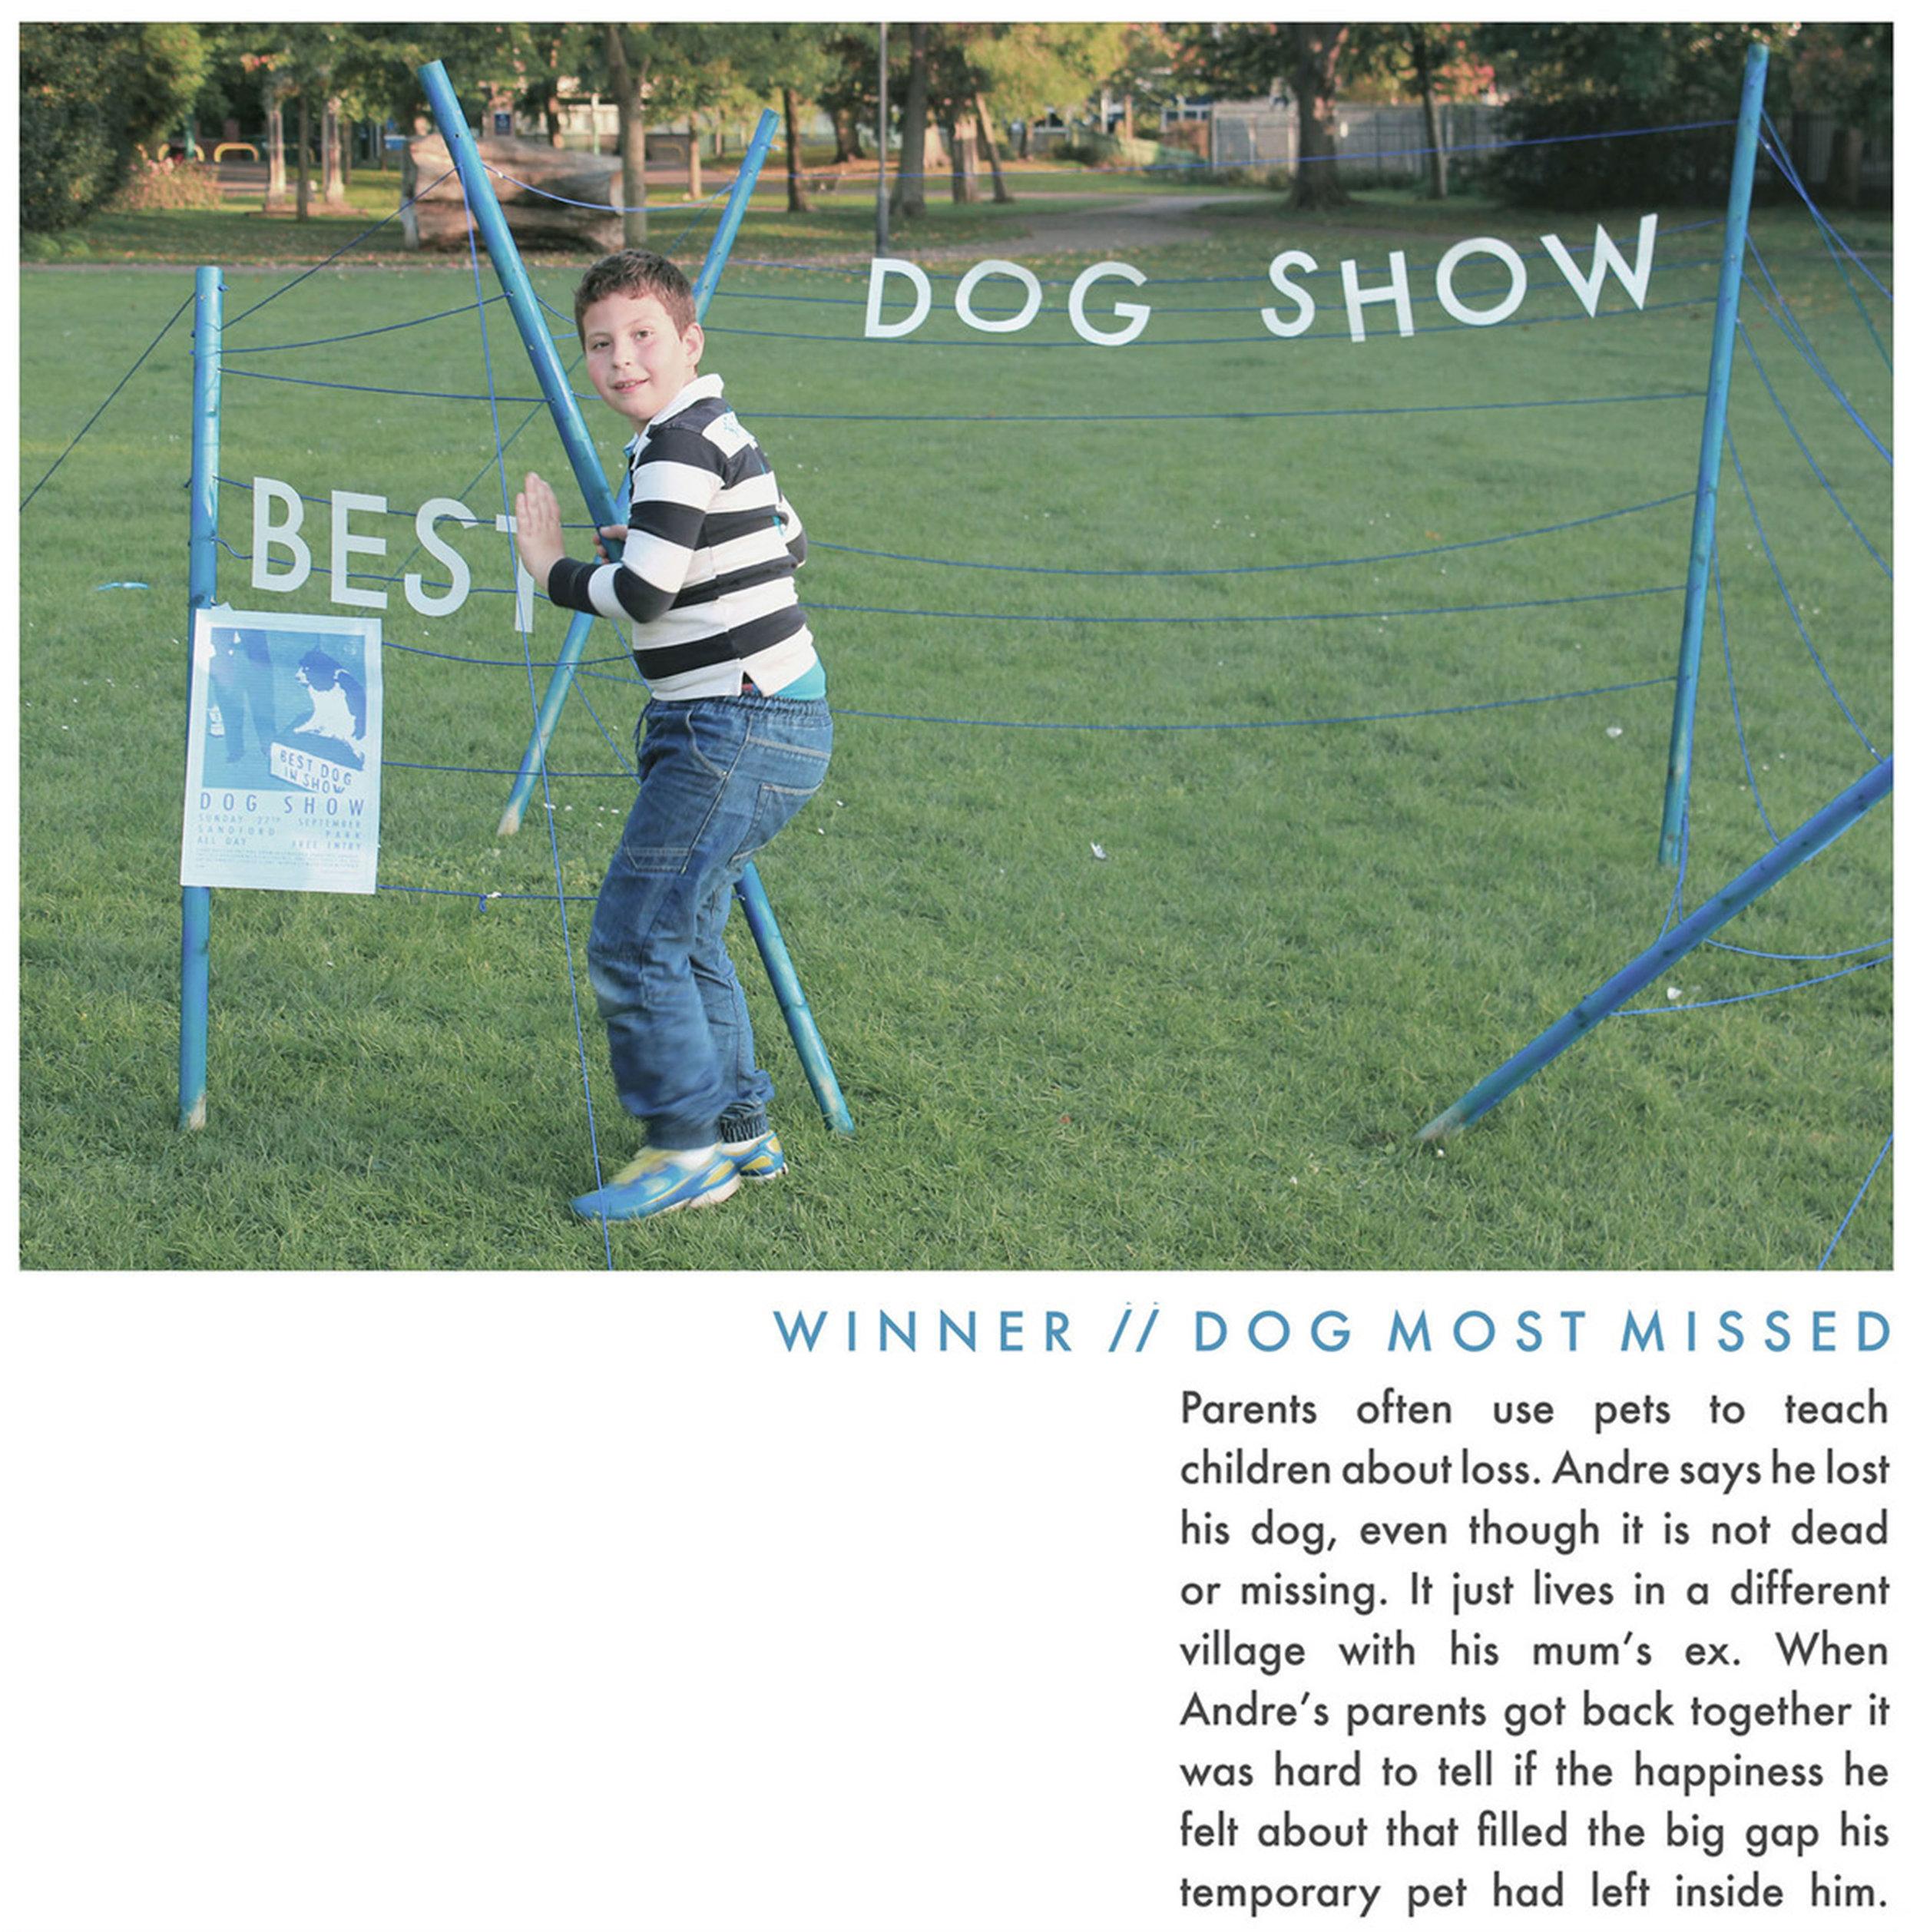 dogshow2.jpg